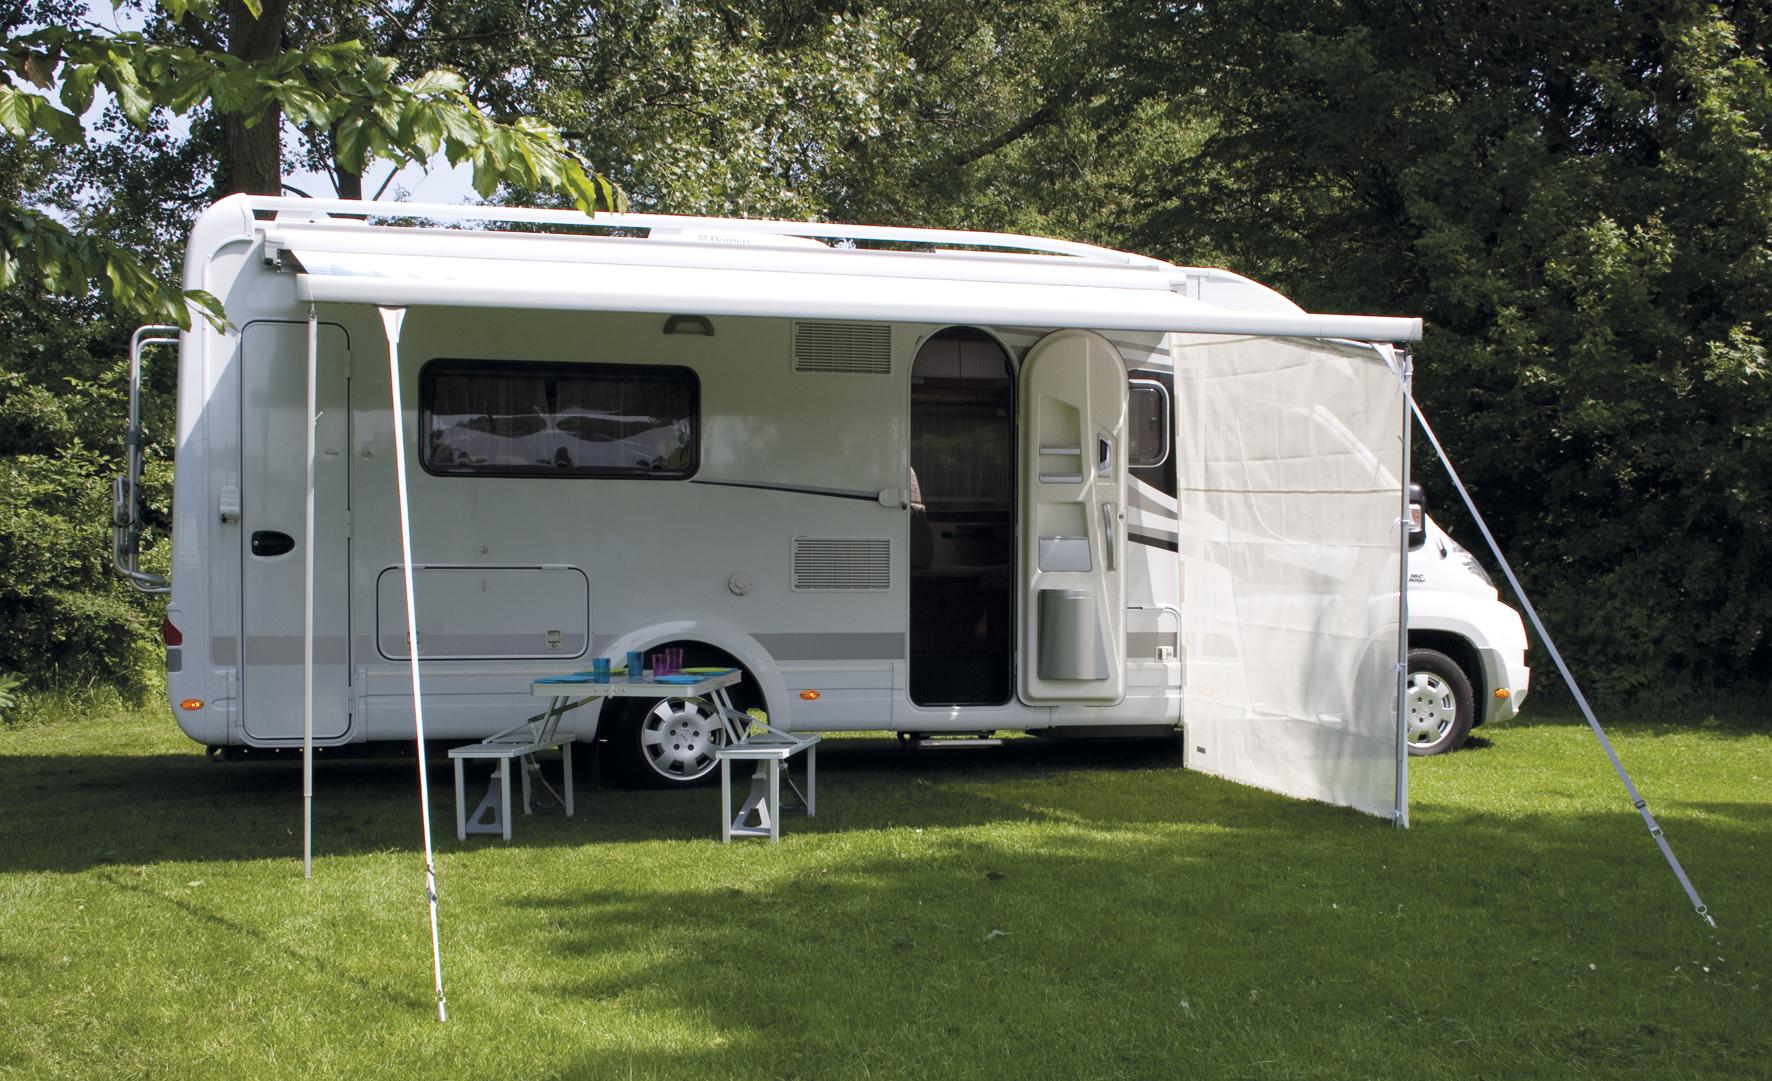 Stormafspanning luifel eurotrail for Luifel caravan aanbieding